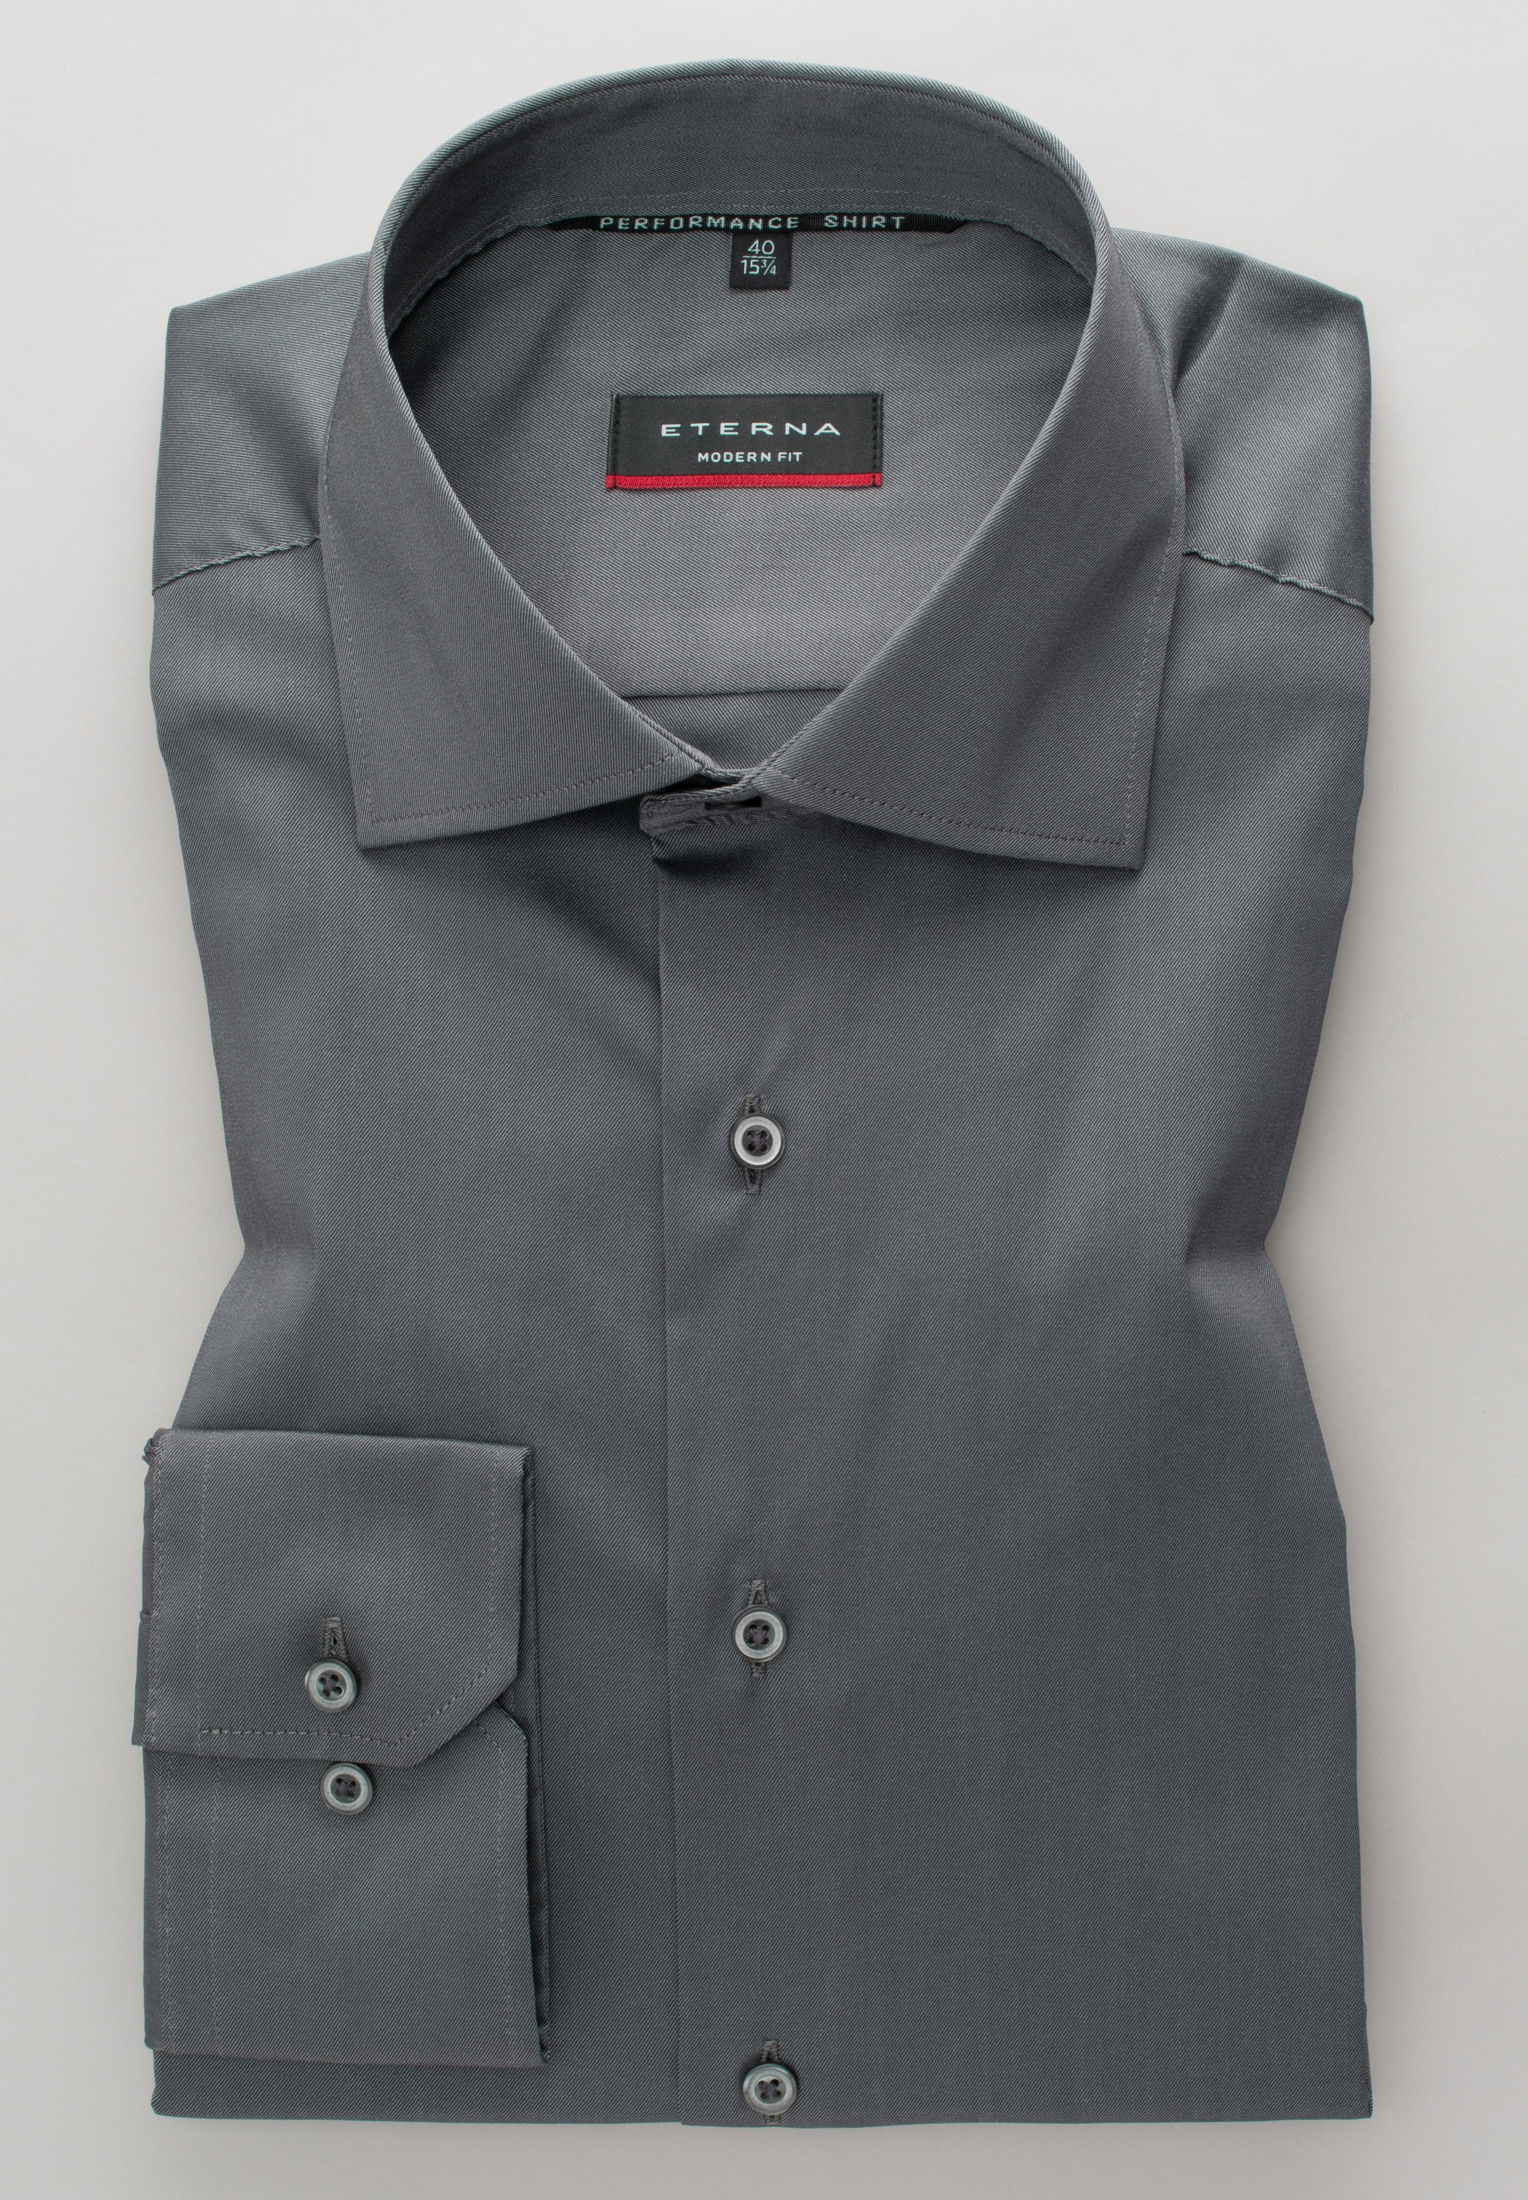 Eterna Businesshemd MODERN FIT, Langarm grau Herren Business Hemden Businessmode